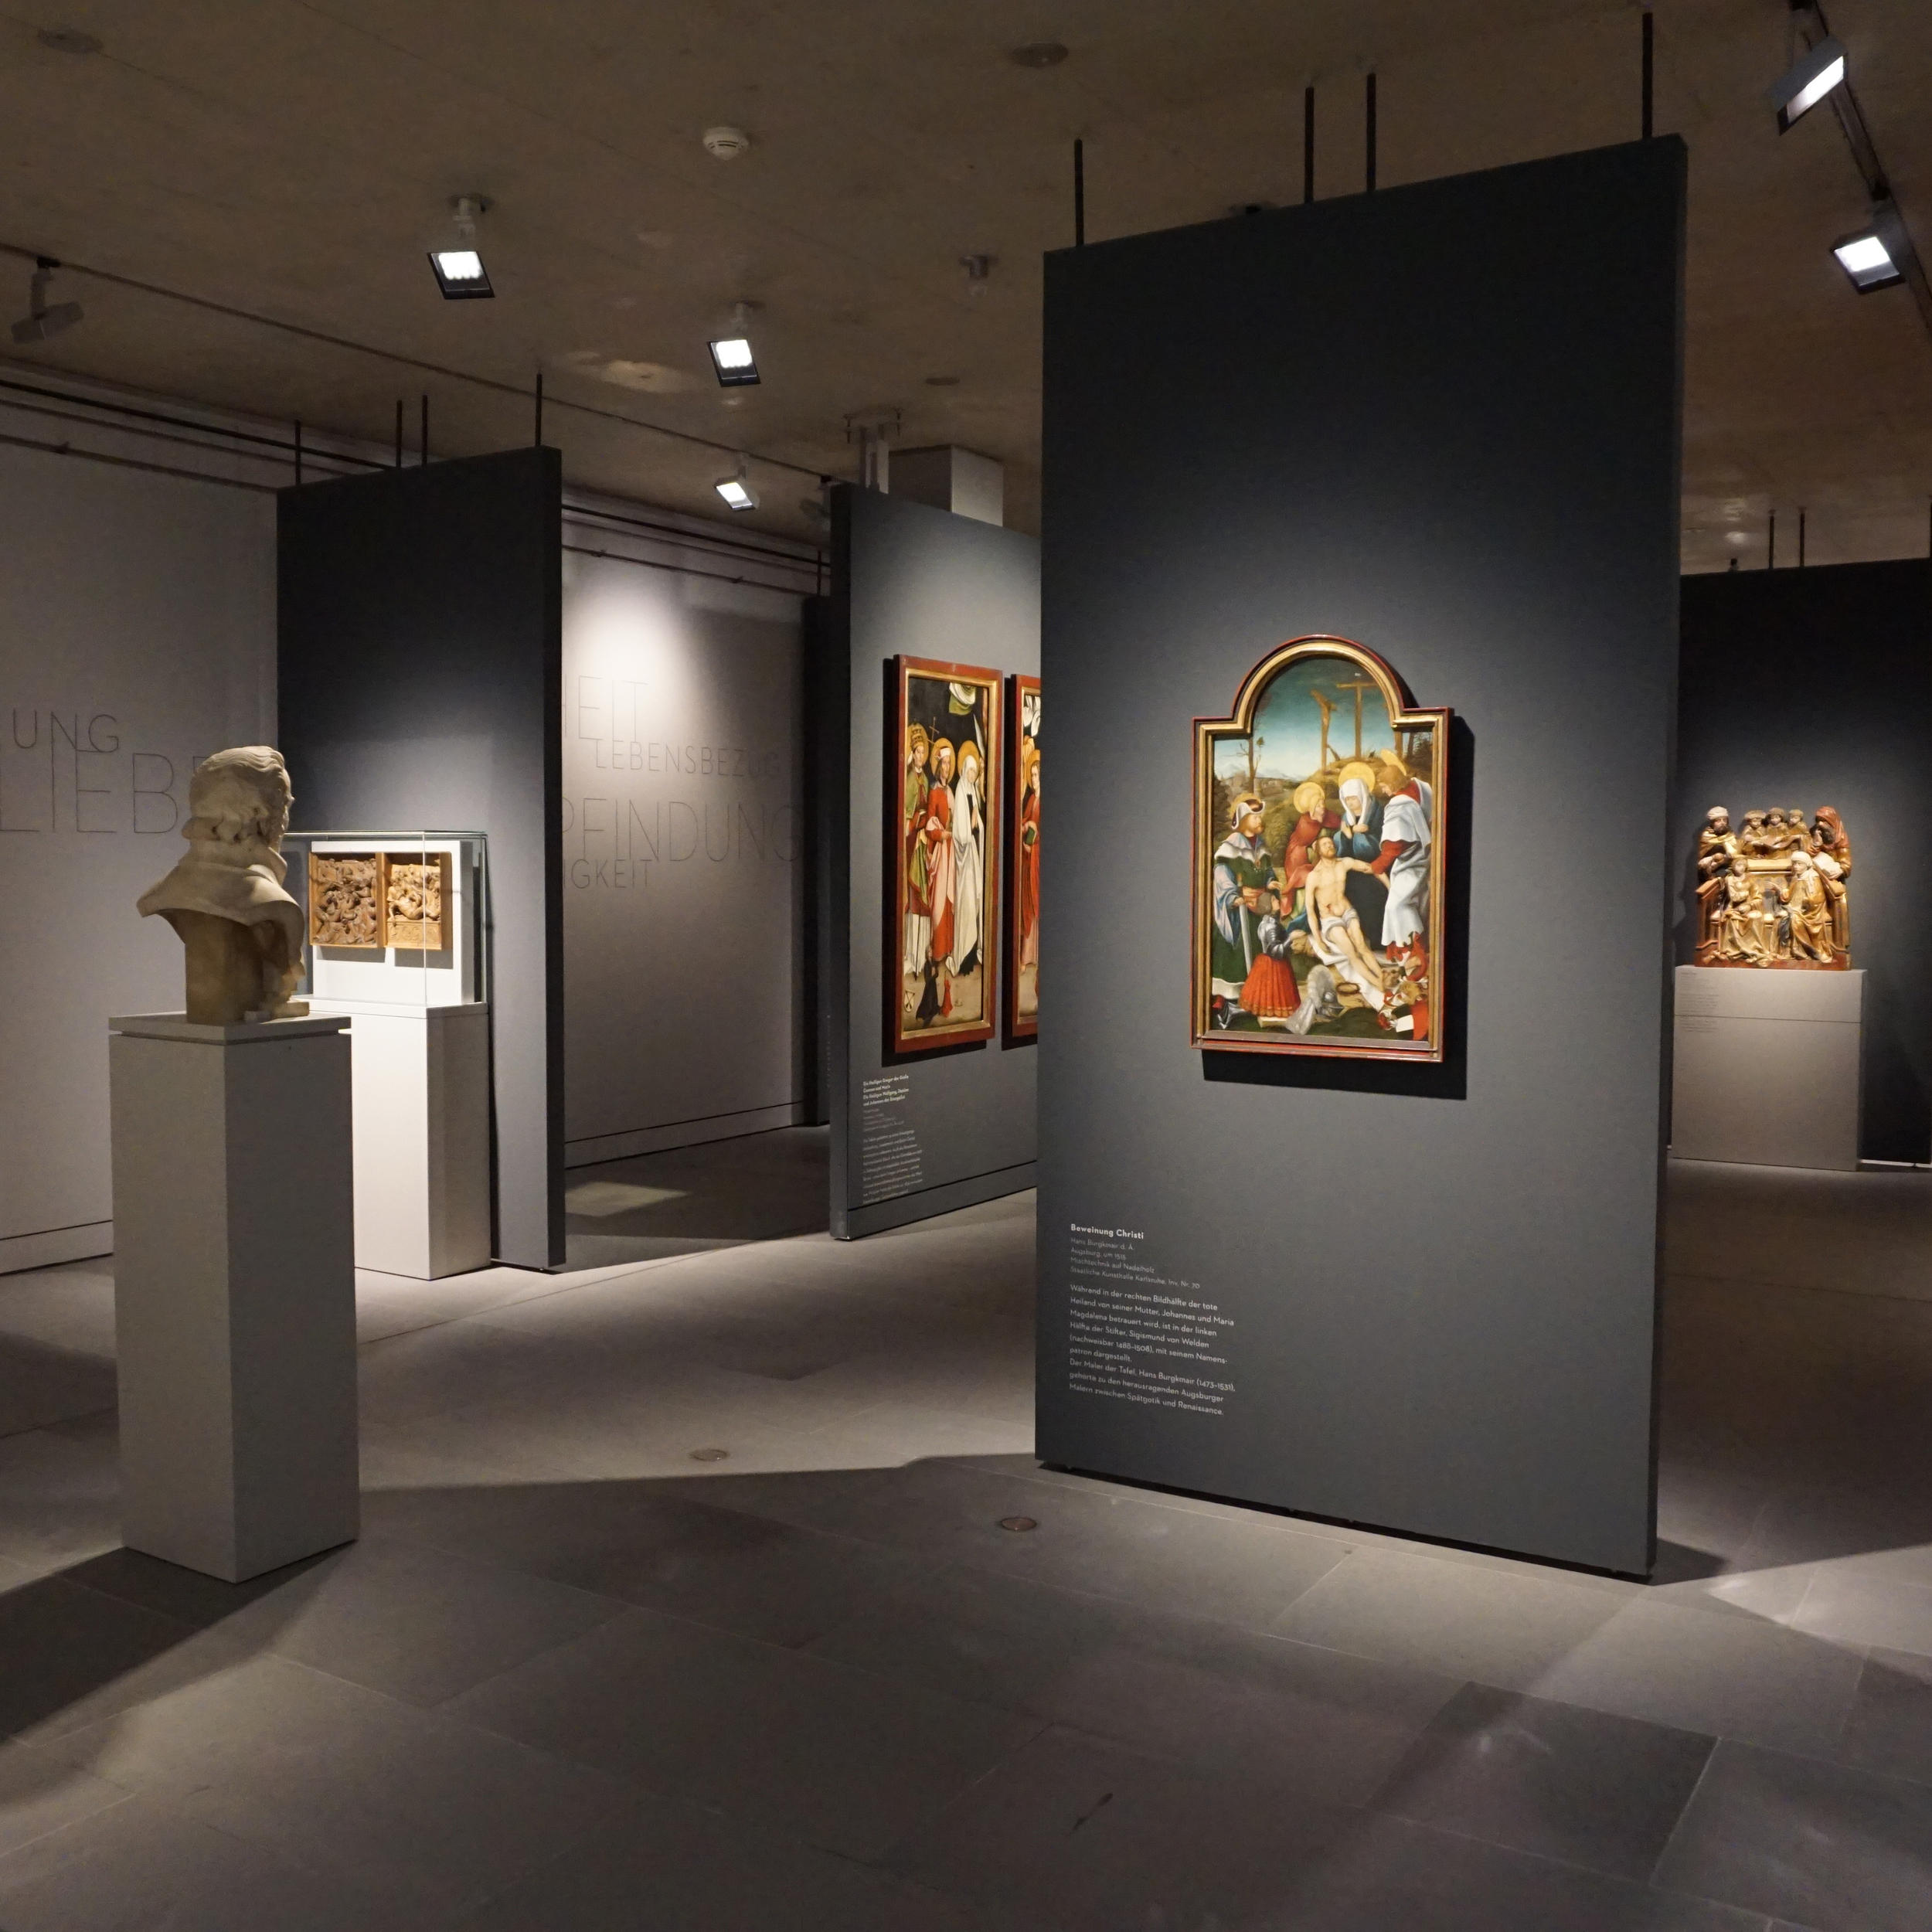 Demirag-Architekten-Diözesan-museum-johann-baptist-hirscher-glaube-kunst-hingabe-eroeffnung-05.jpg